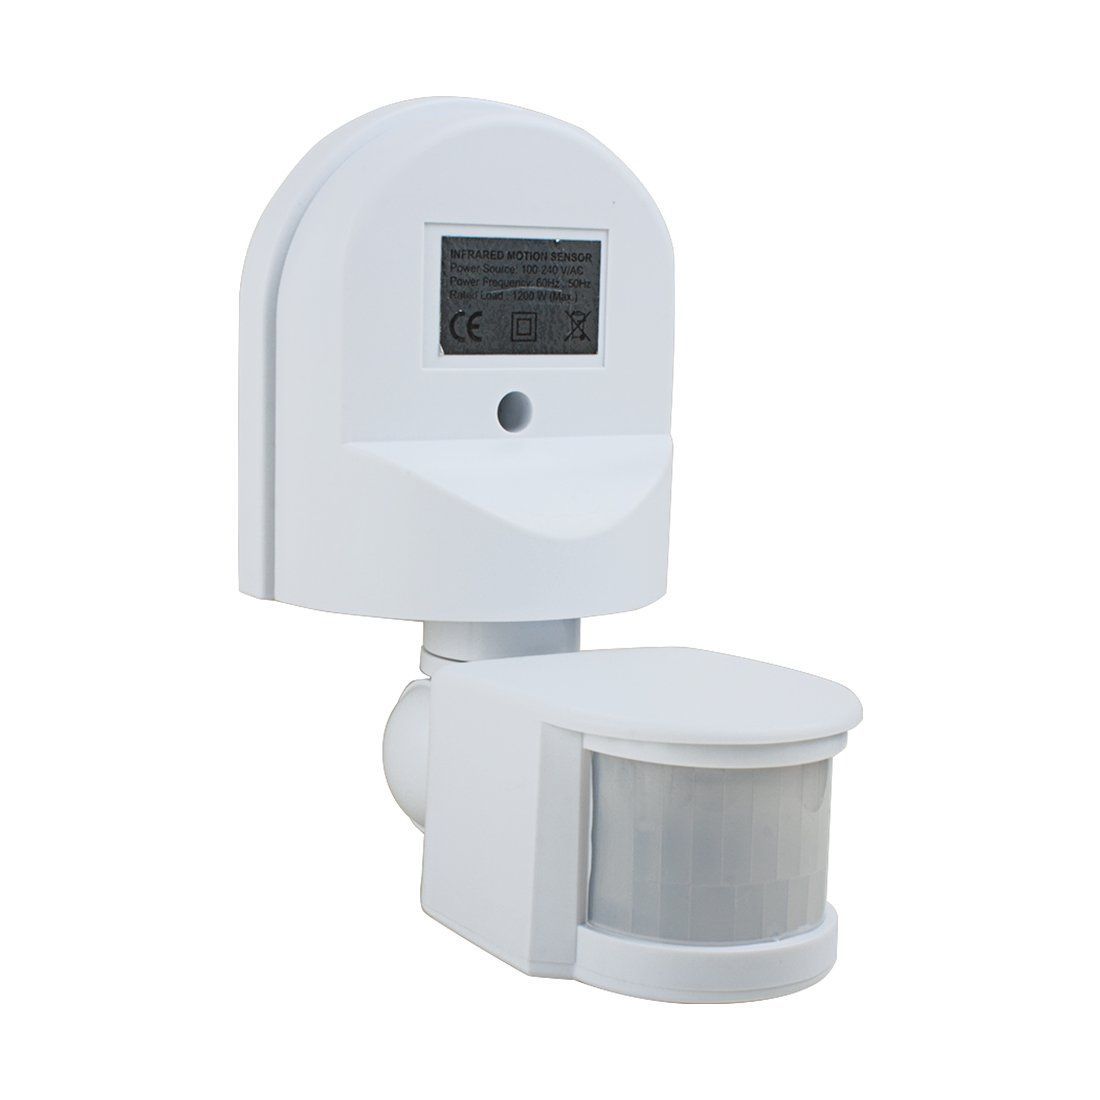 Uxcell Motion Sensor Switch Ac 110v